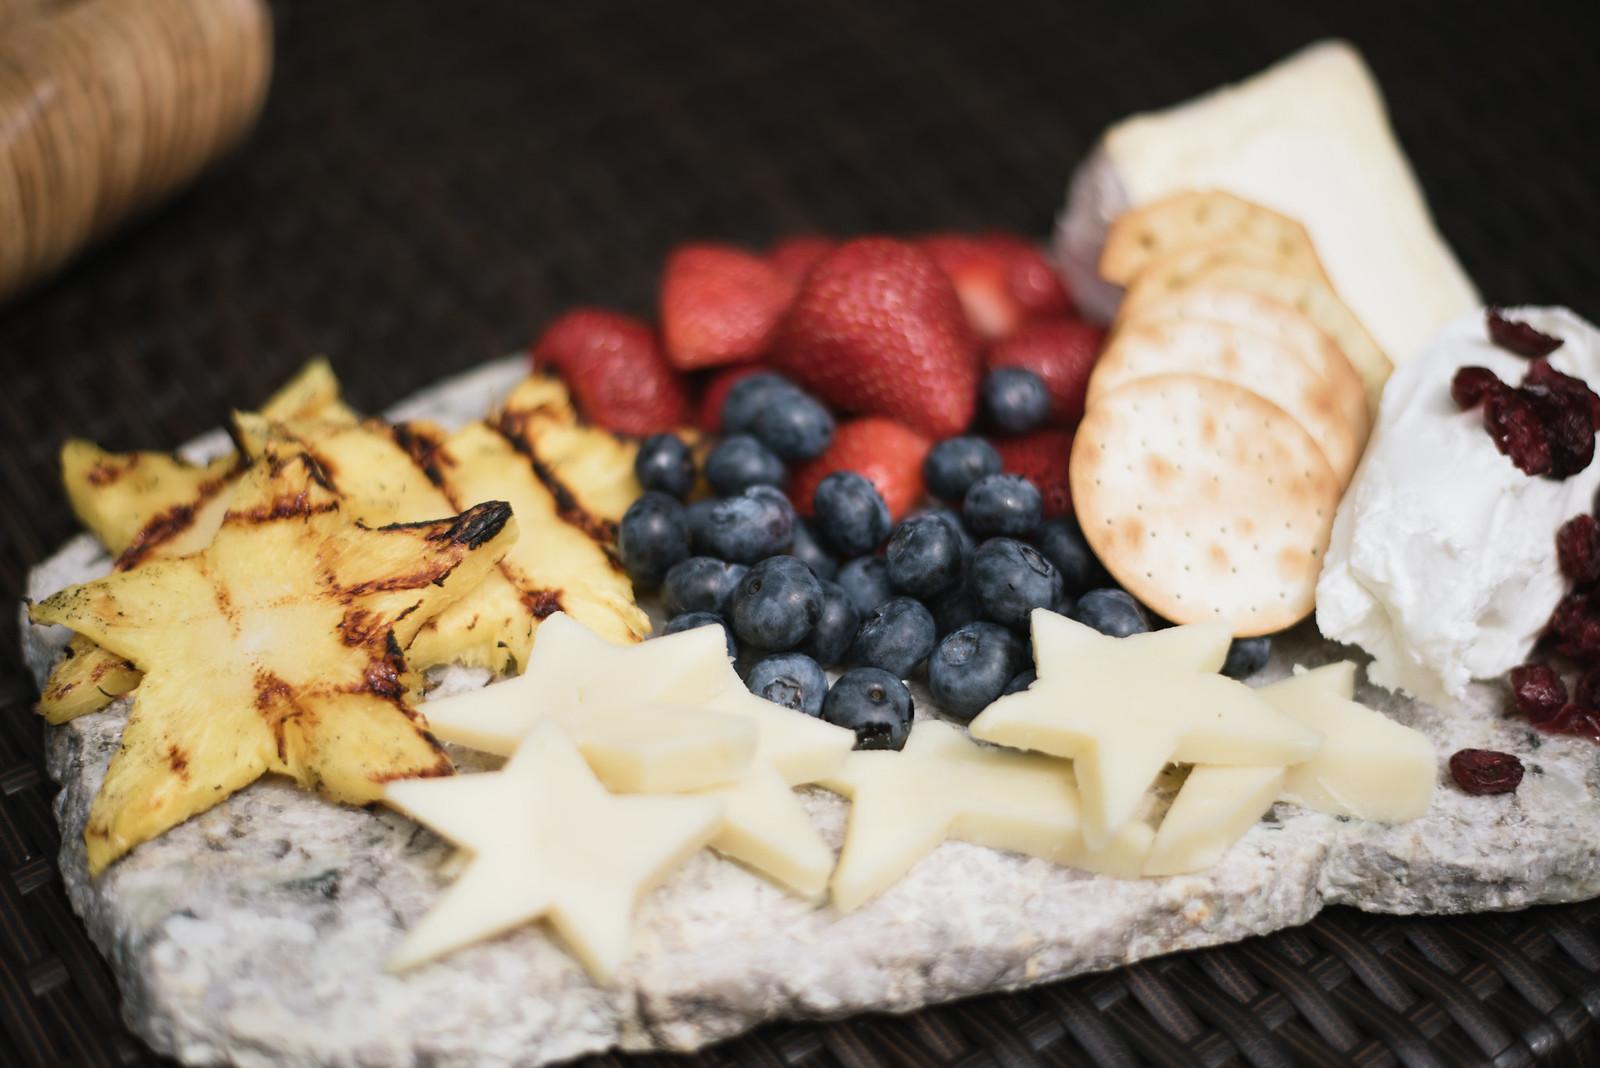 Fruit and Cheese Plate DIY Tutorial on juliettelaura.blogspot.com